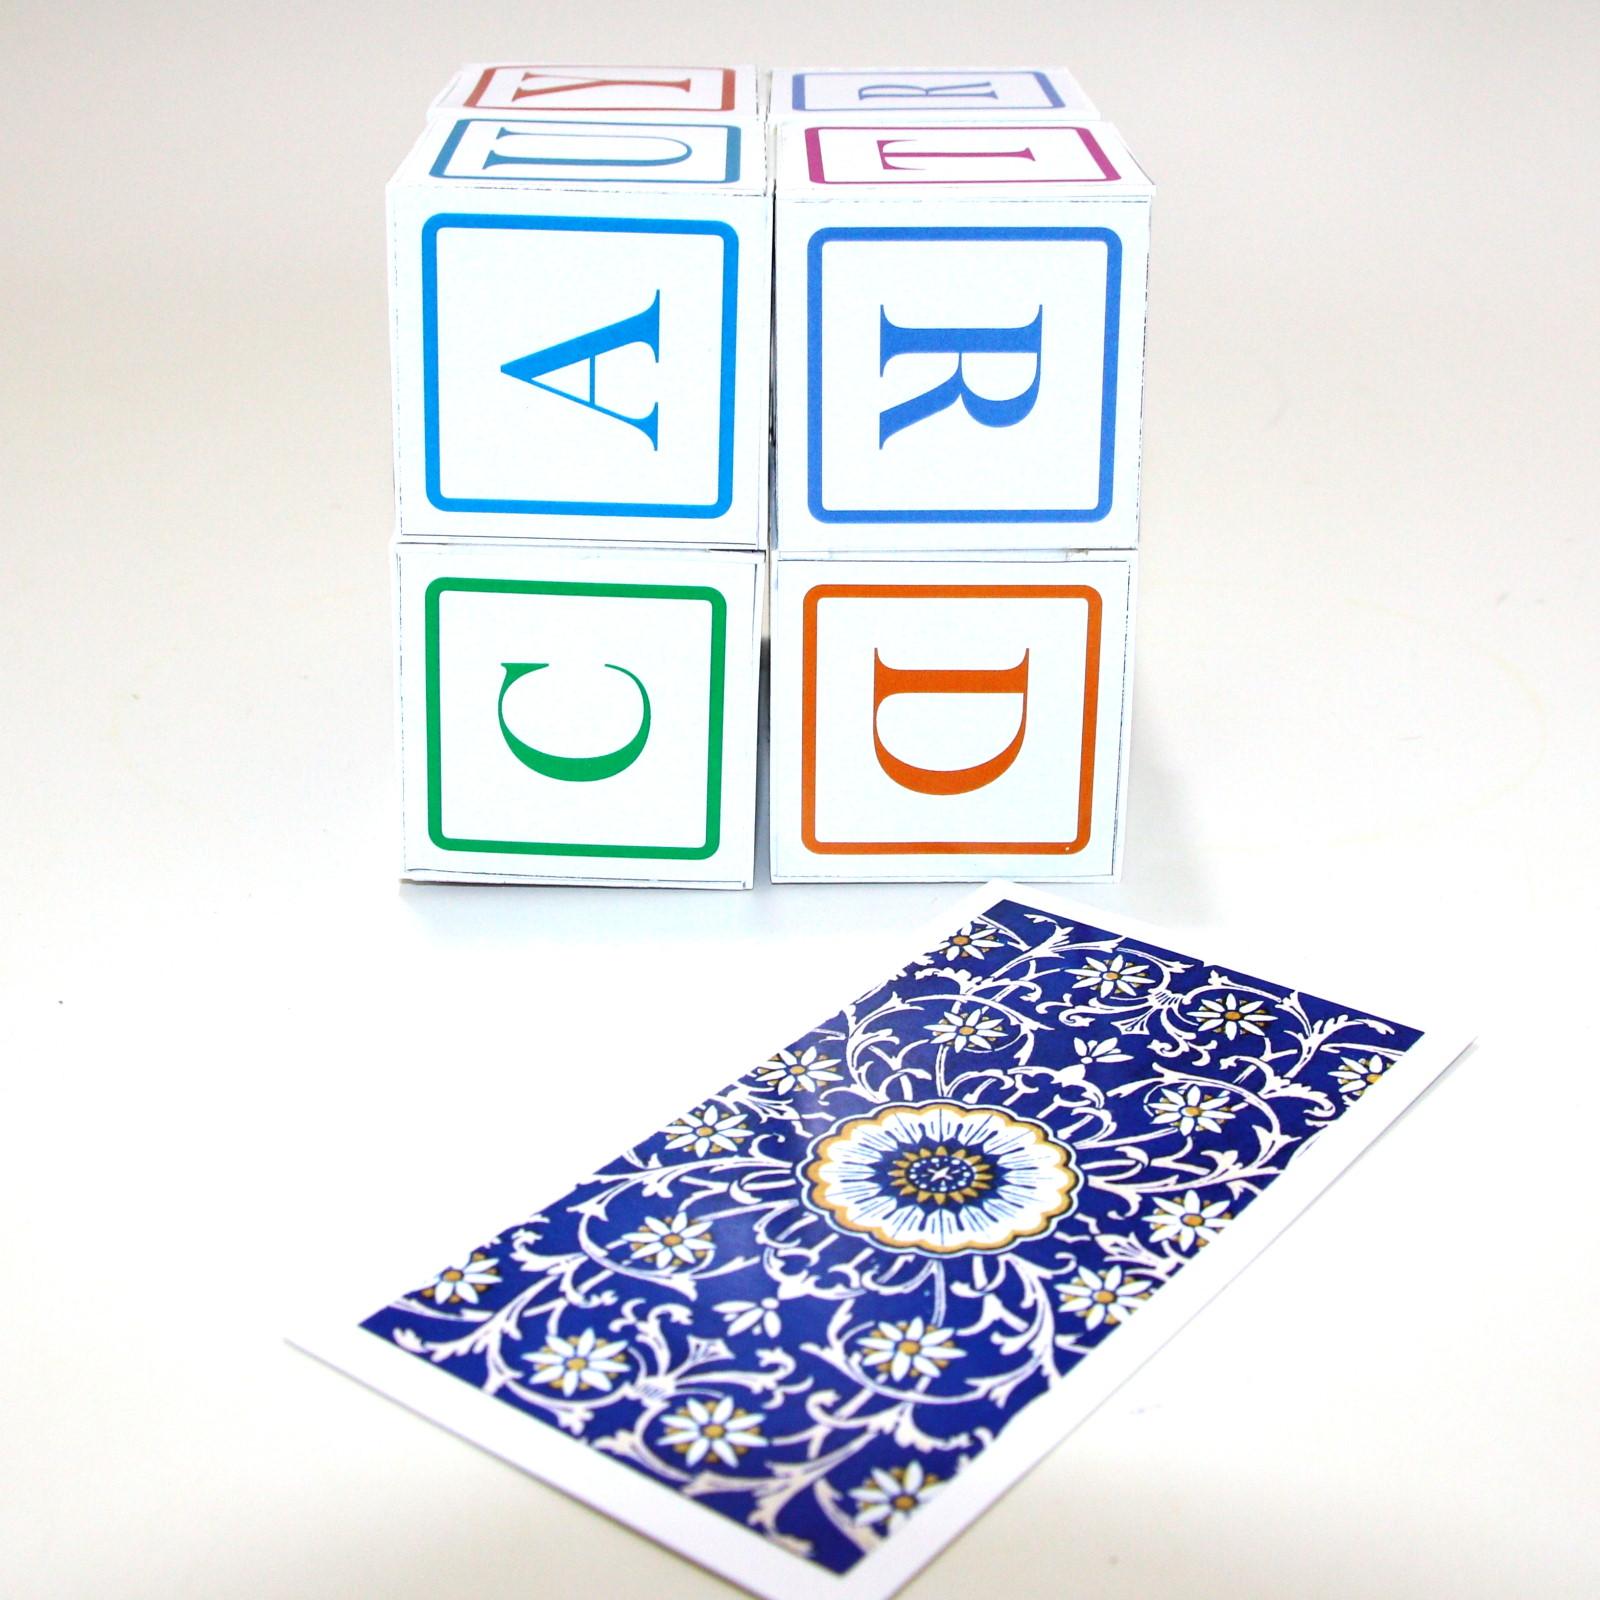 ABC Block Prediction by Nahuel Olivera